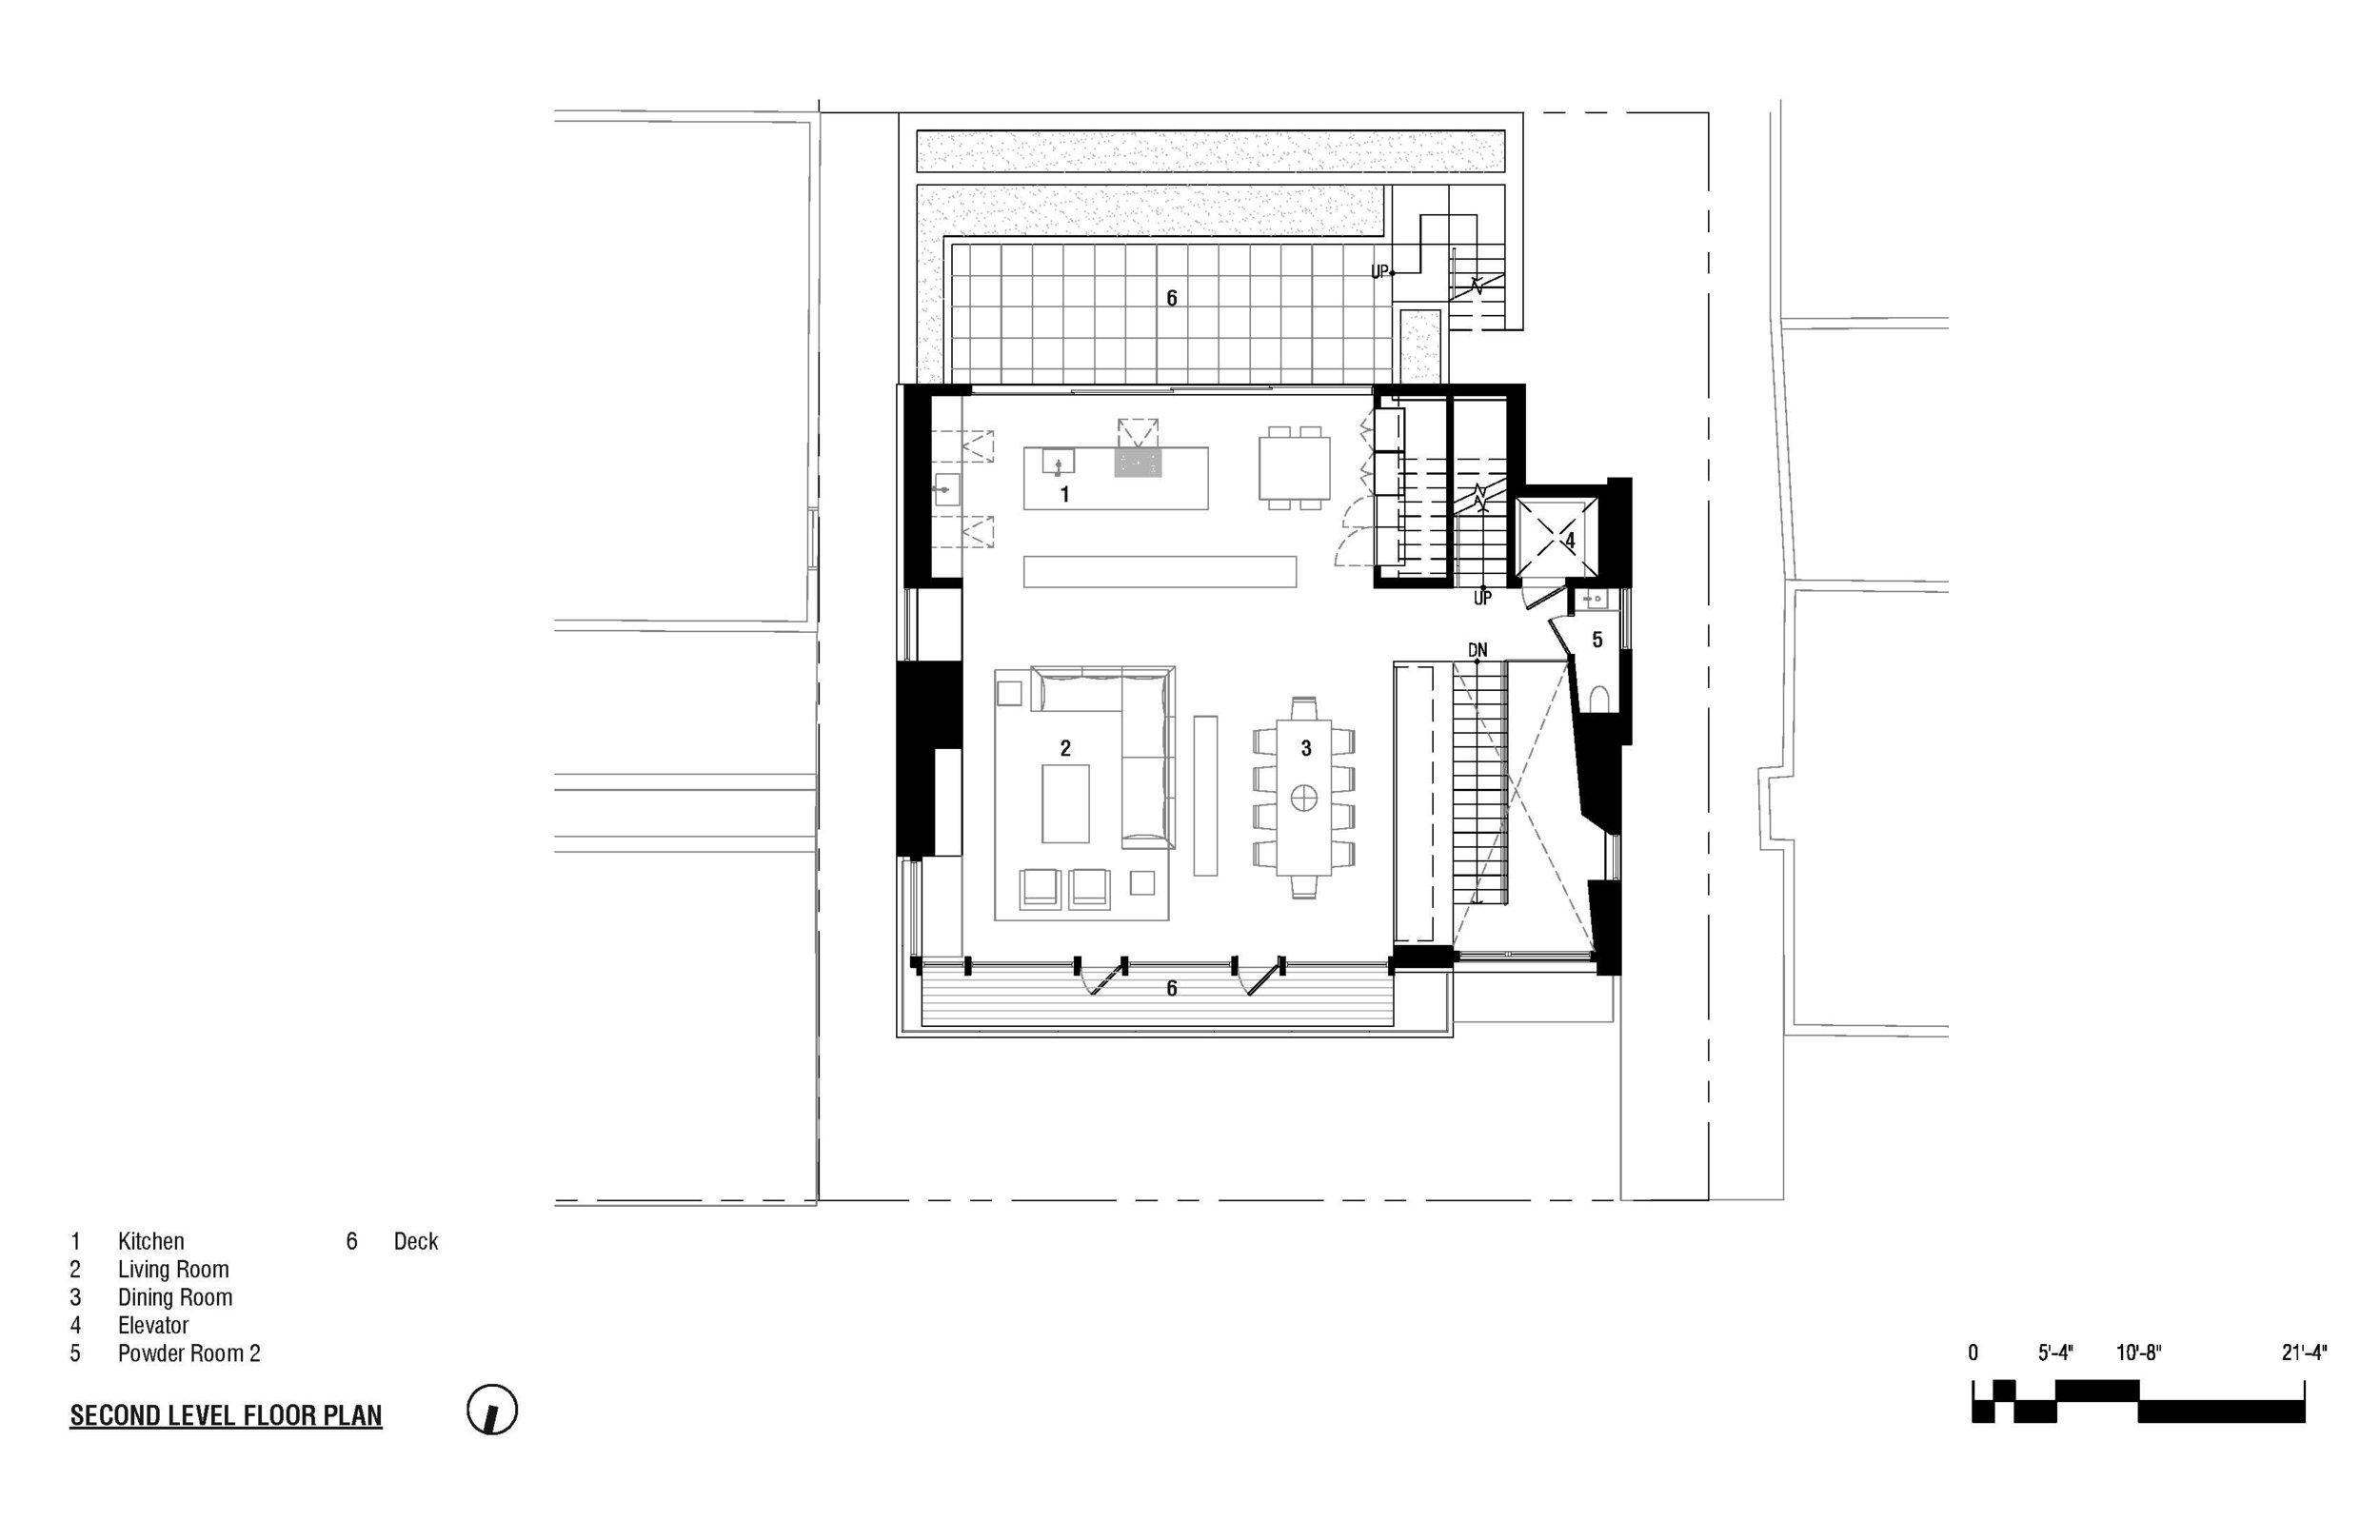 2018-0517 Vallejo- Floor Plan Layouts (1)_Page_3.jpg